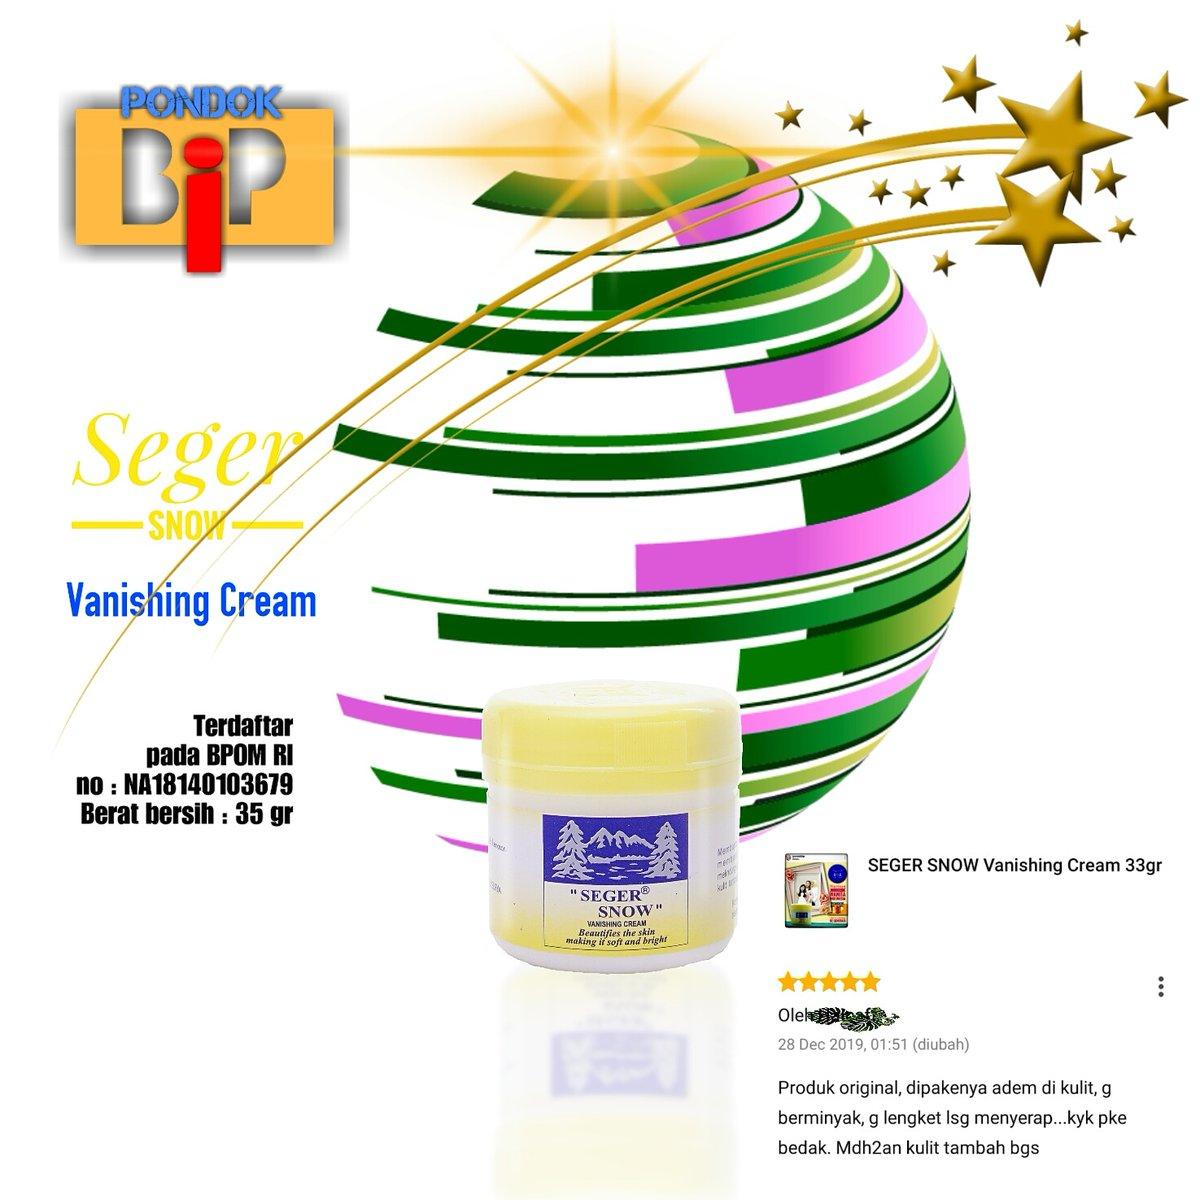 Seger Snow Vanishing Cream Terdaftar pada BPOM RI #diRumahAja #BanggaBuatanIndonesia #segersnow #skincare #vanishing #moisturizer #pelembab #beauty #kecantikan #perawatanwajah #GratisOngkir #GratisOngkirXtra #ShopeeID #TokopediaWIB #BebasOngkir #Bukalapak #OngkirGratis